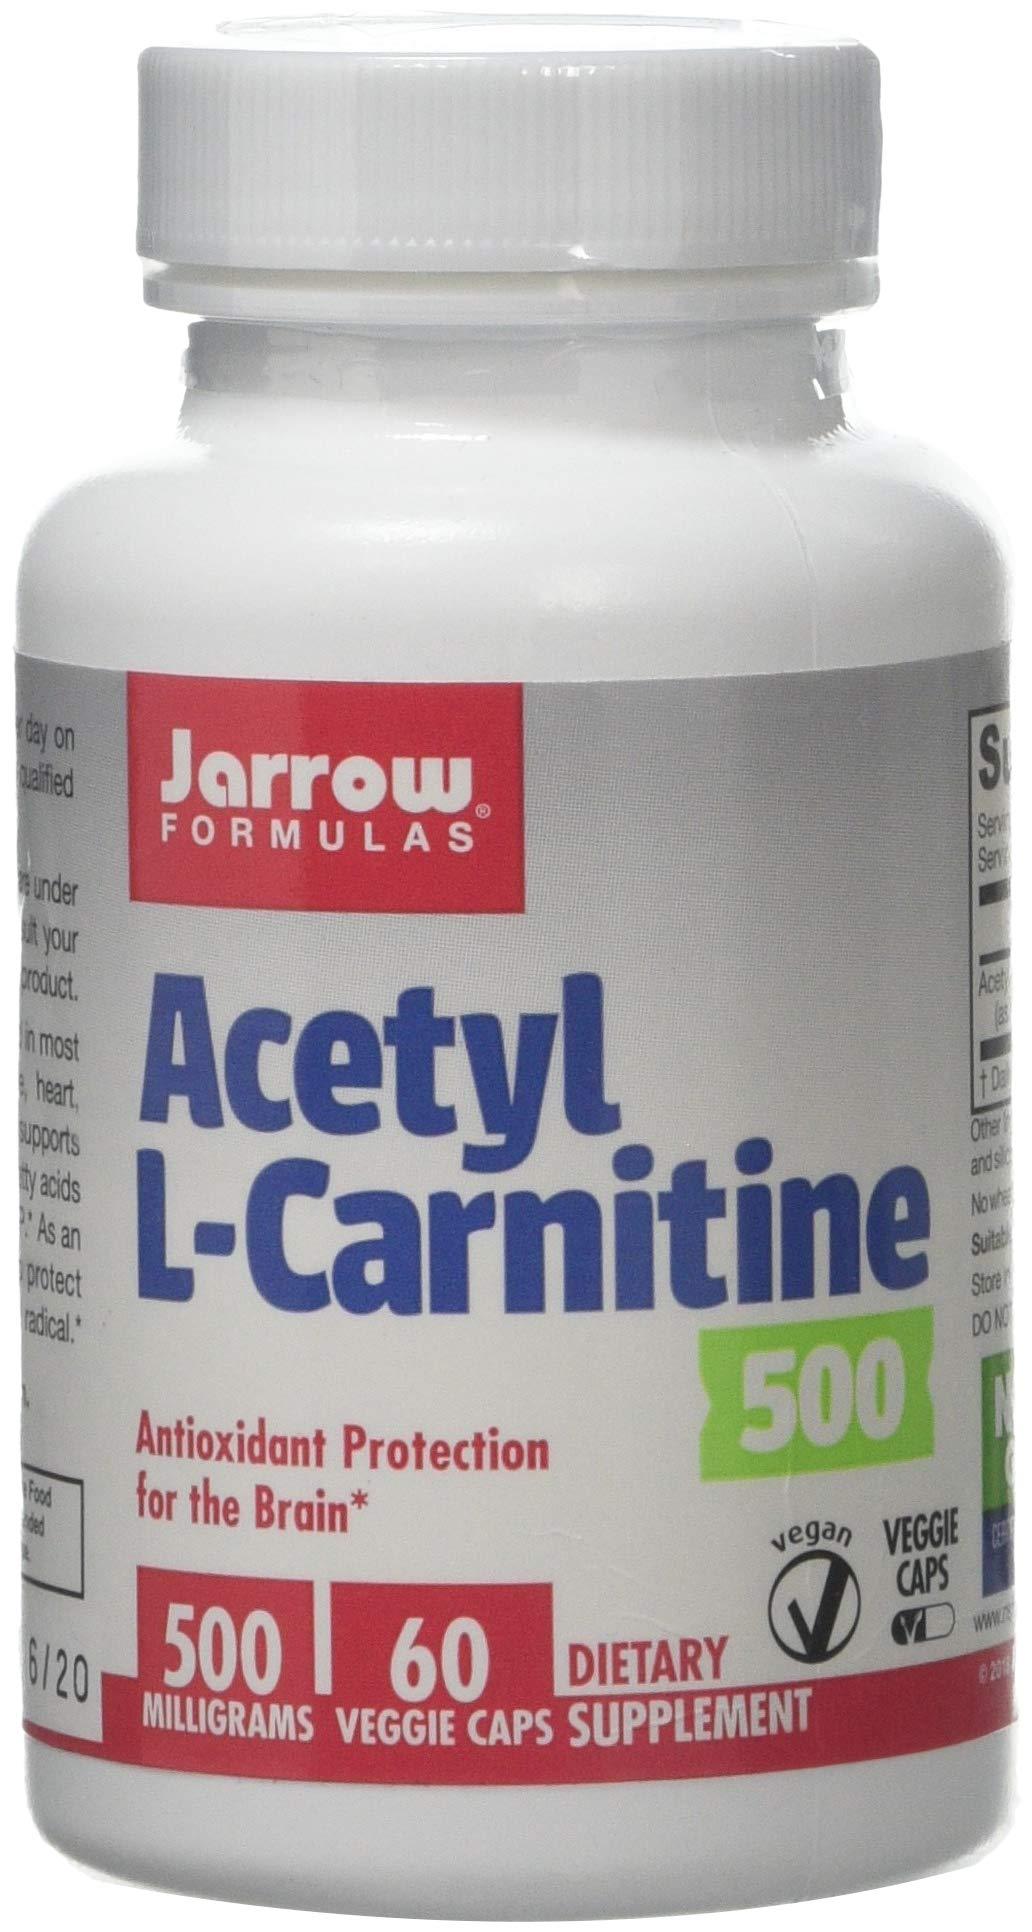 Jarrow Formulas Acetyl Lcarnitine Antioxidant Protection The Brain Earplug , 14 cm, Black HS-0503